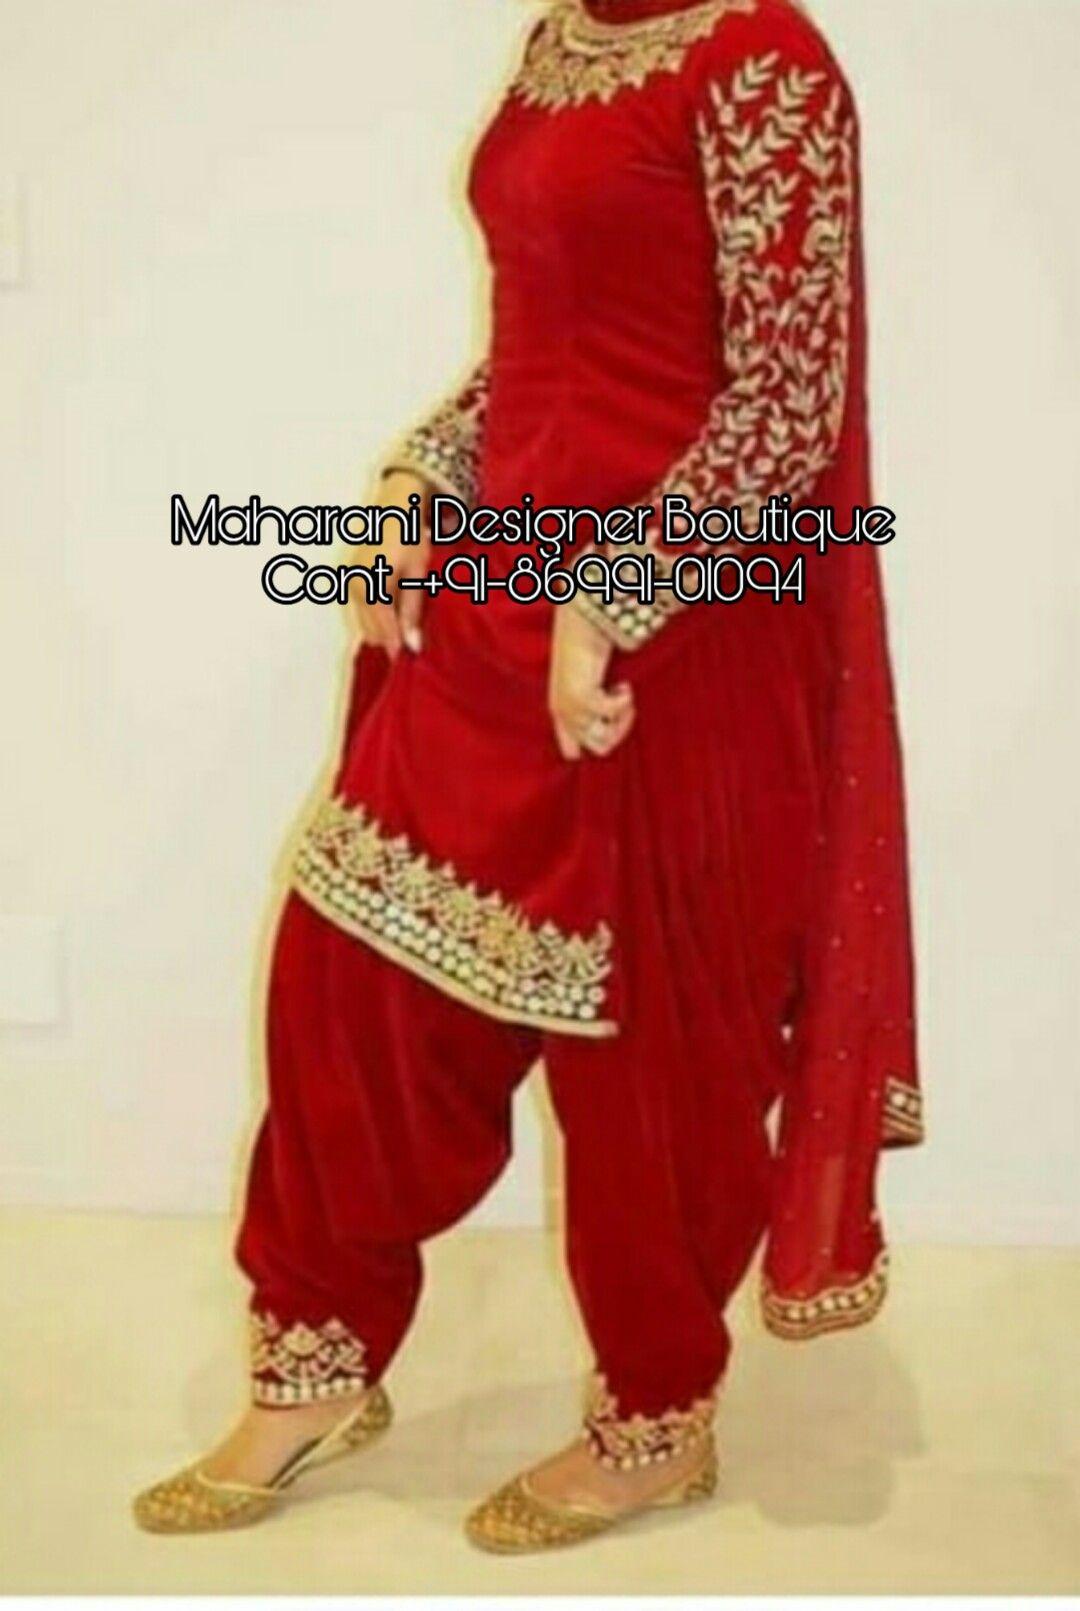 Buy Punjabi Suits Online In Latest Styles Trending In 2020 A Wide Range Of Punjabi Dresses Including Patiala Salwar Kameez In Stunning New Designs Fancy Suit Women Suits Wedding Designer Jumpsuits